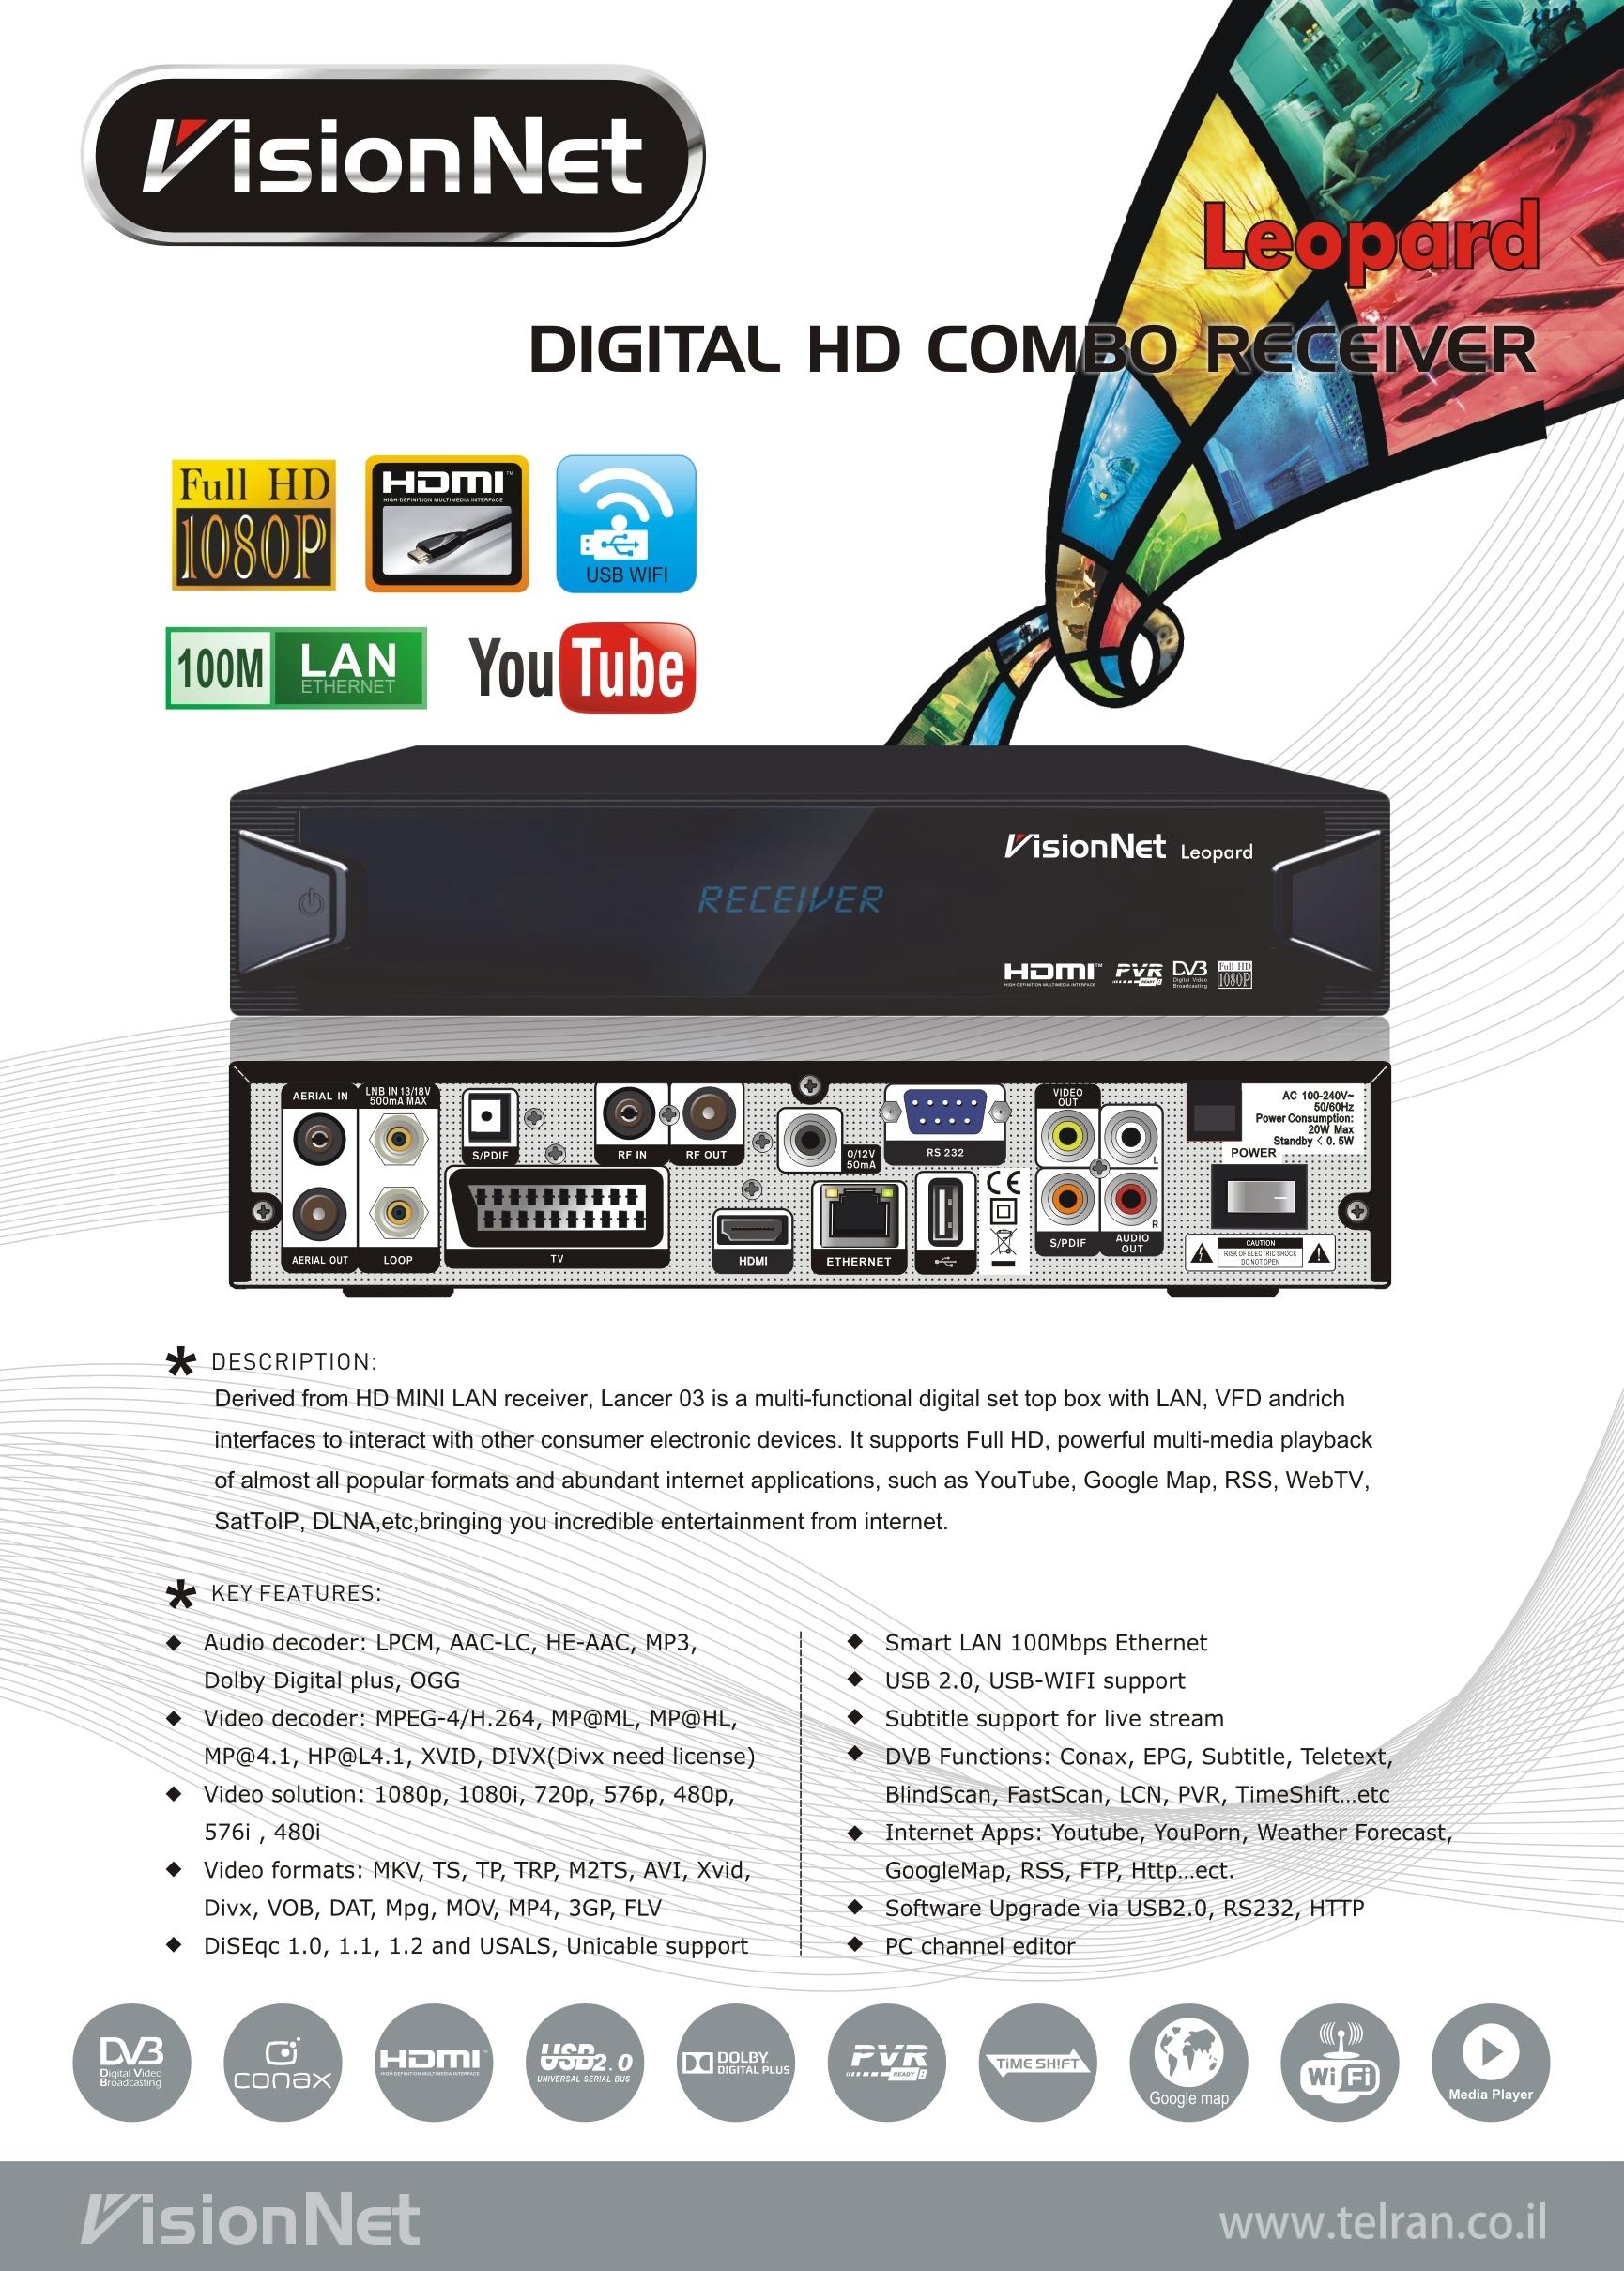 Leopard Digital HD Combo Receiver